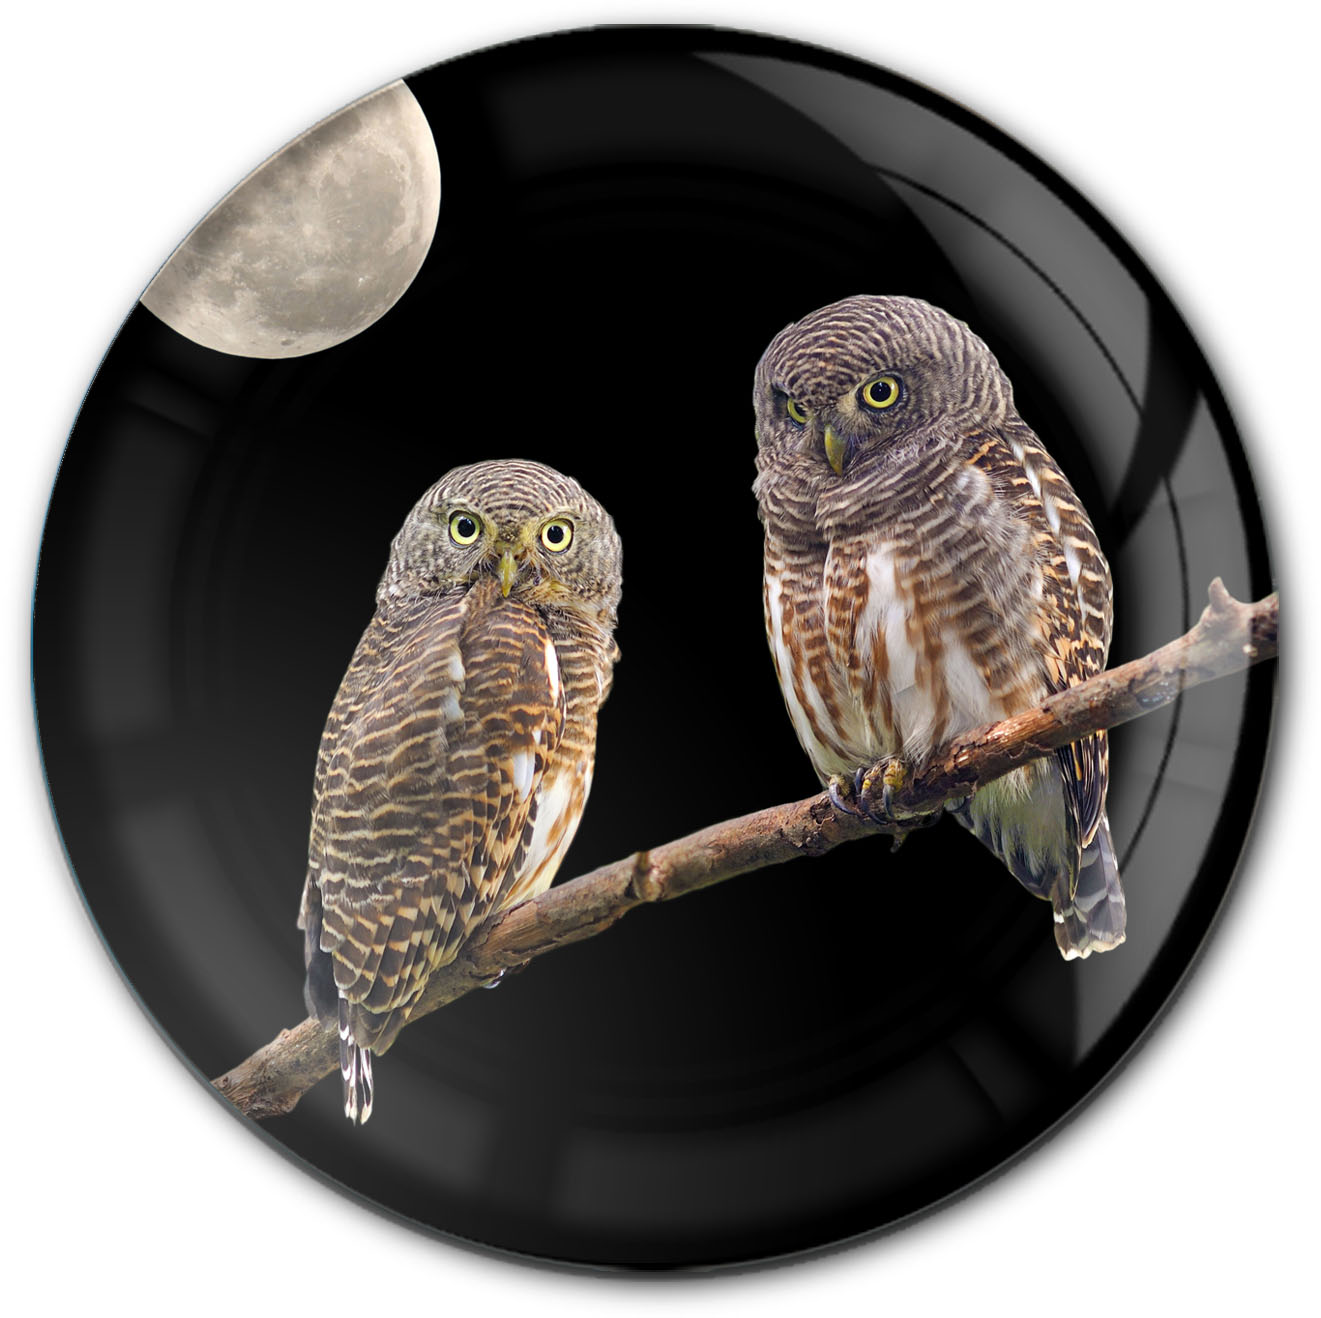 Magnet / Kühlschrankmagnet / Eulen / Raubtiere / Wildvögel